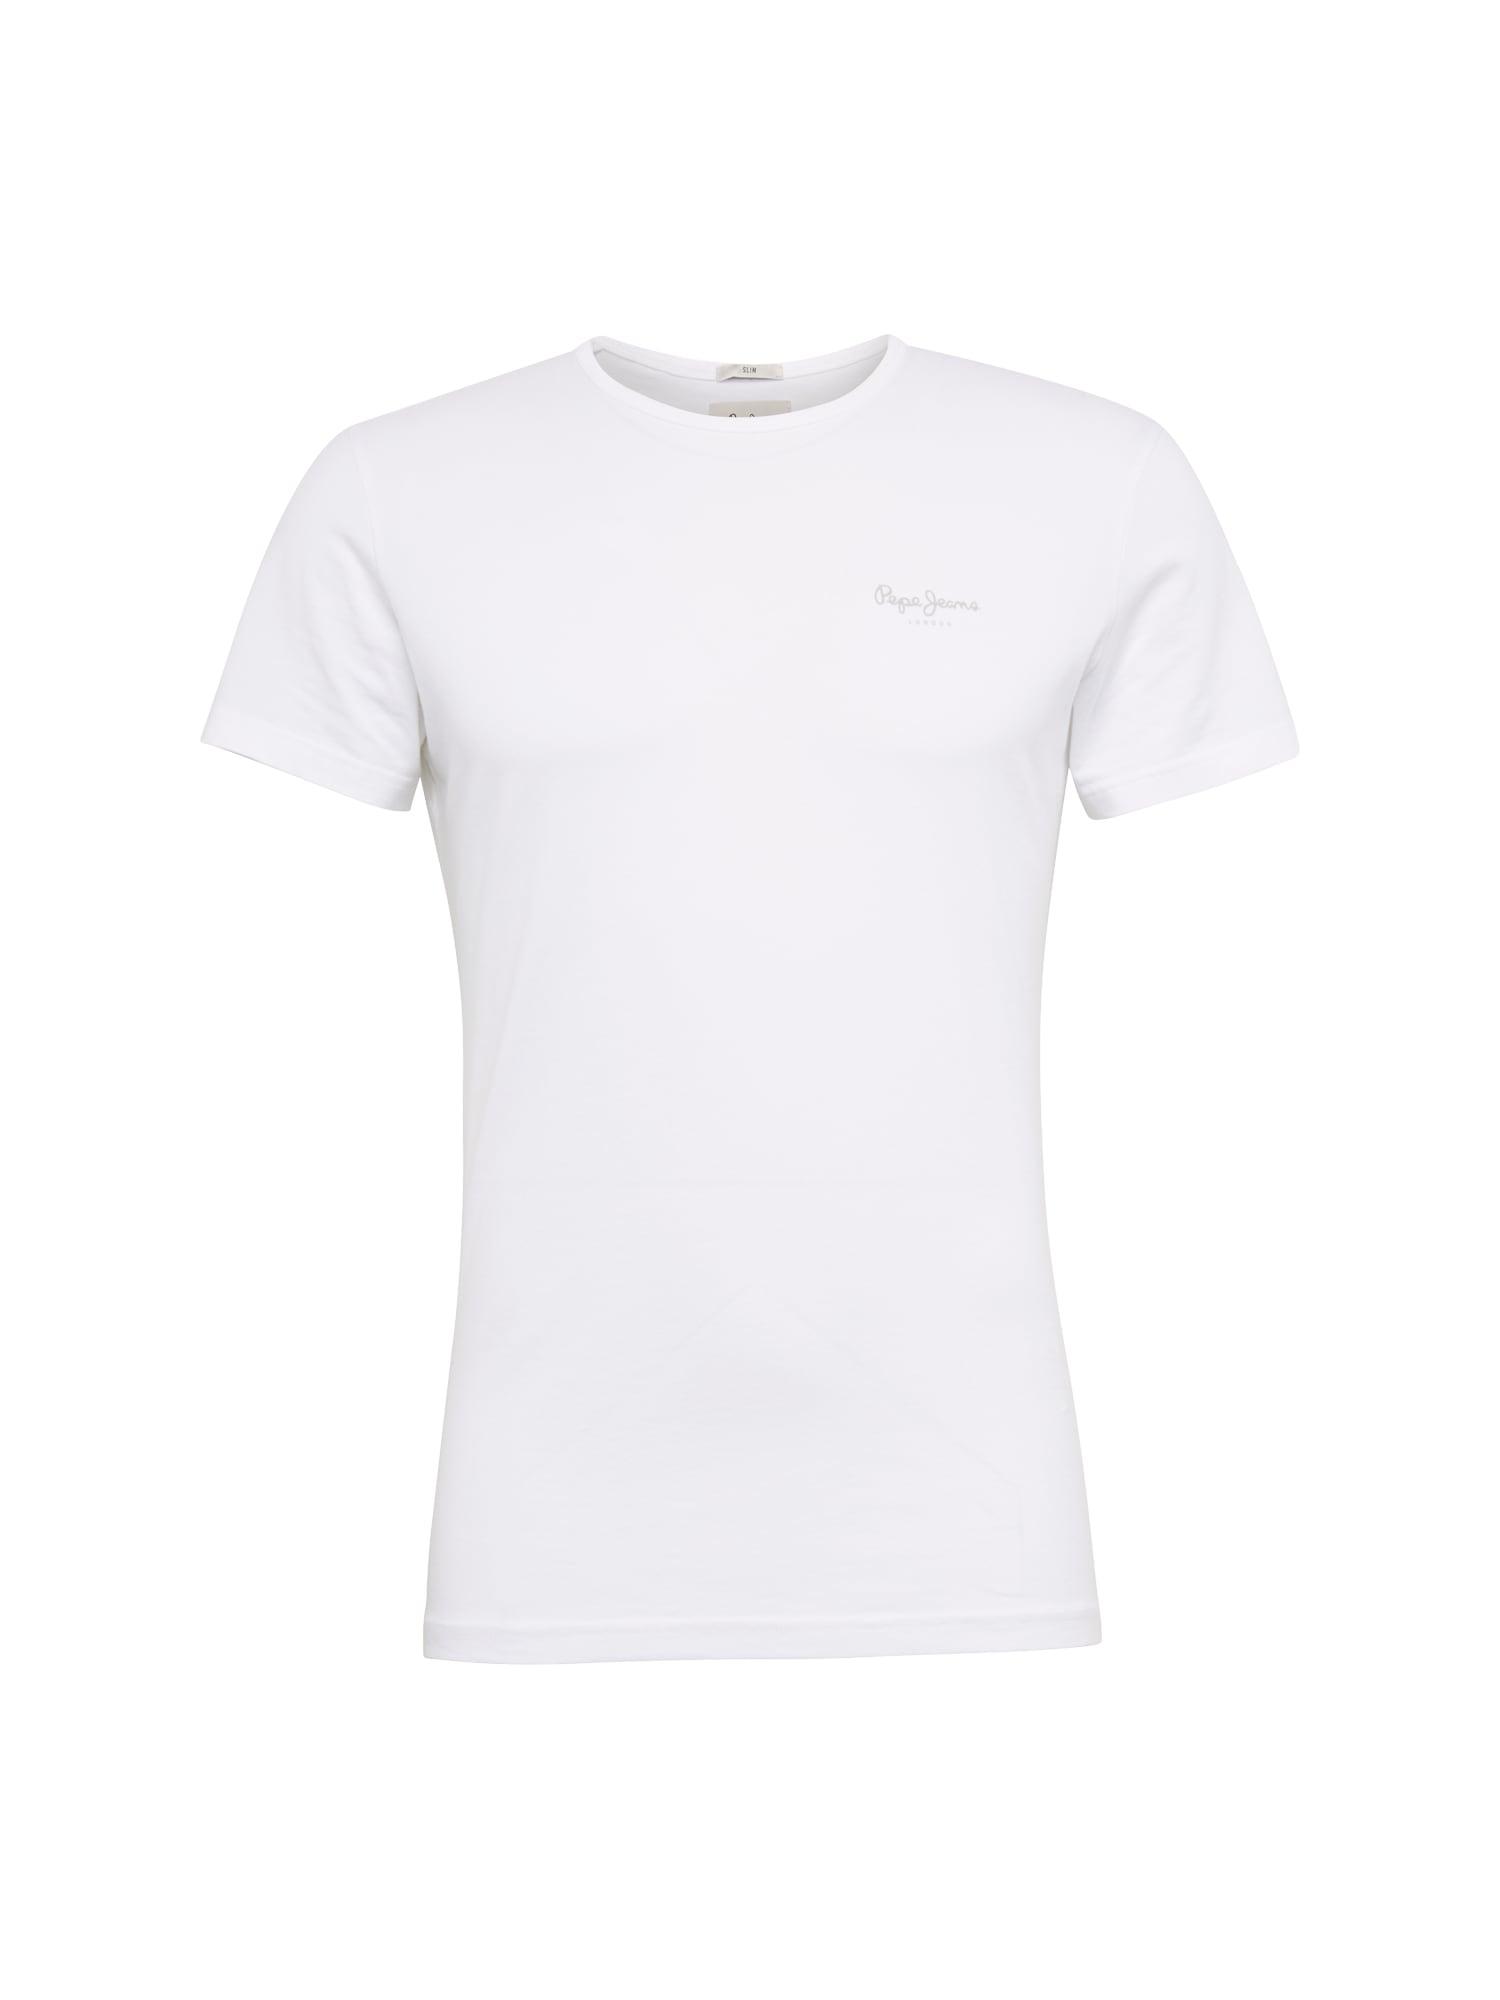 Pepe Jeans Heren Shirt ORIGINAL BASIC S S wit